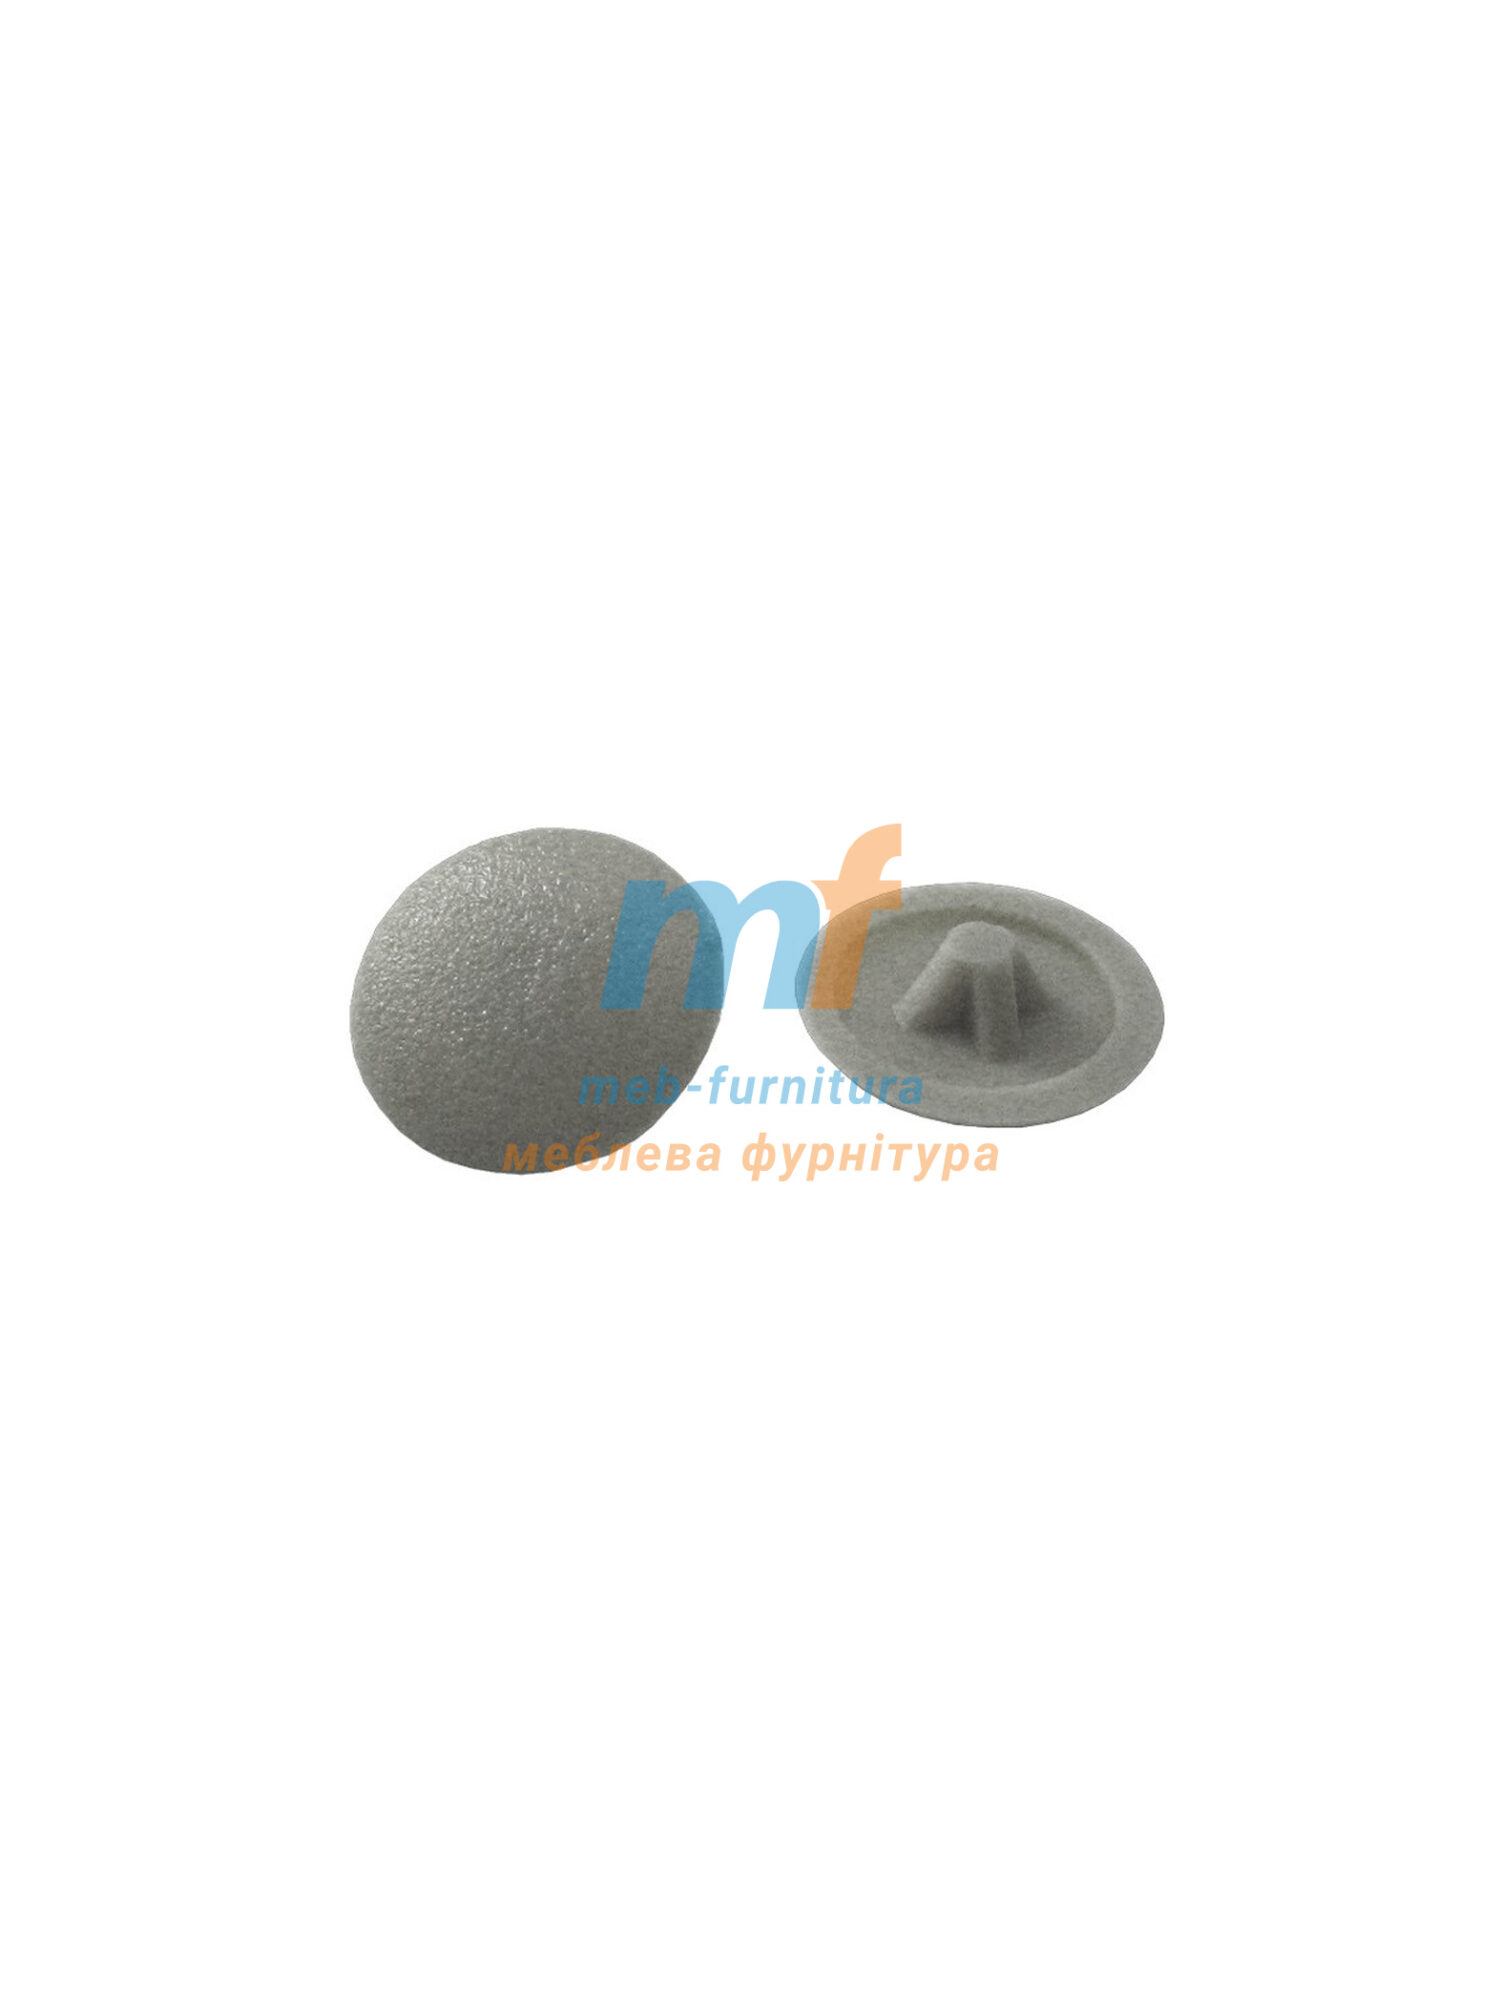 Заглушка под саморез (Темно-Серая) 1000